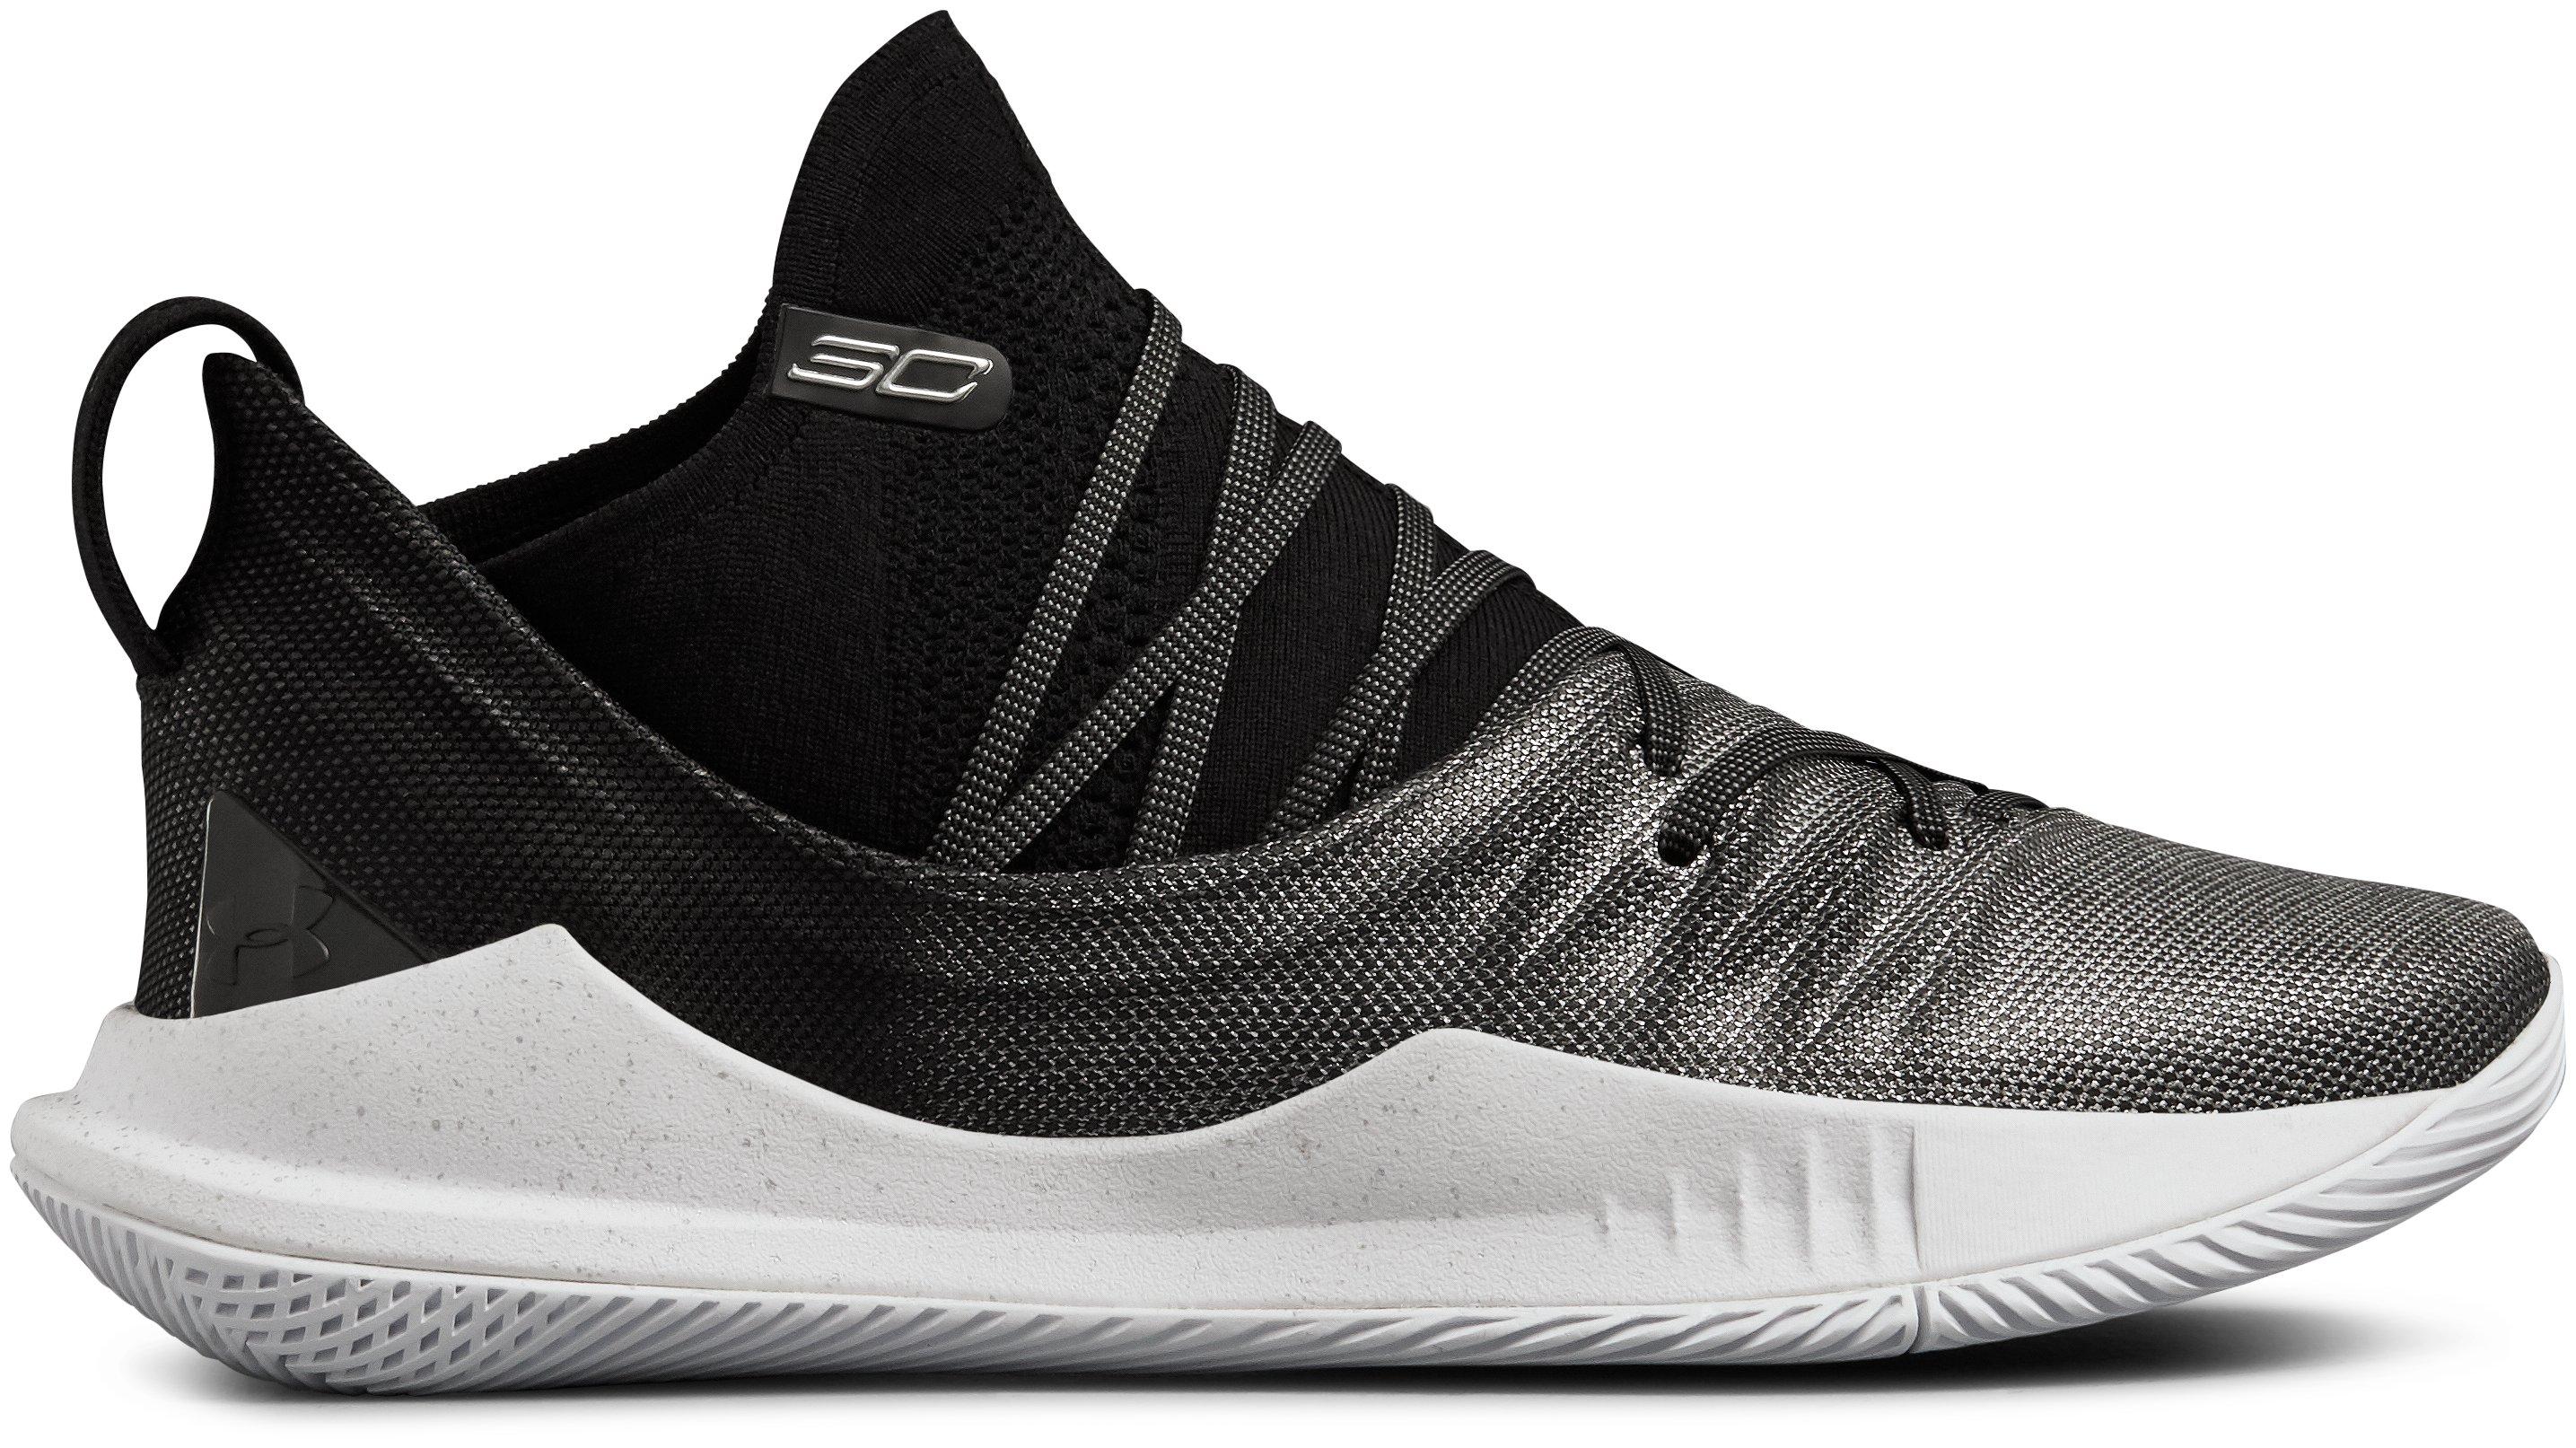 Sepatu Basket UA Curry 5 untuk Pria, 360 degree view